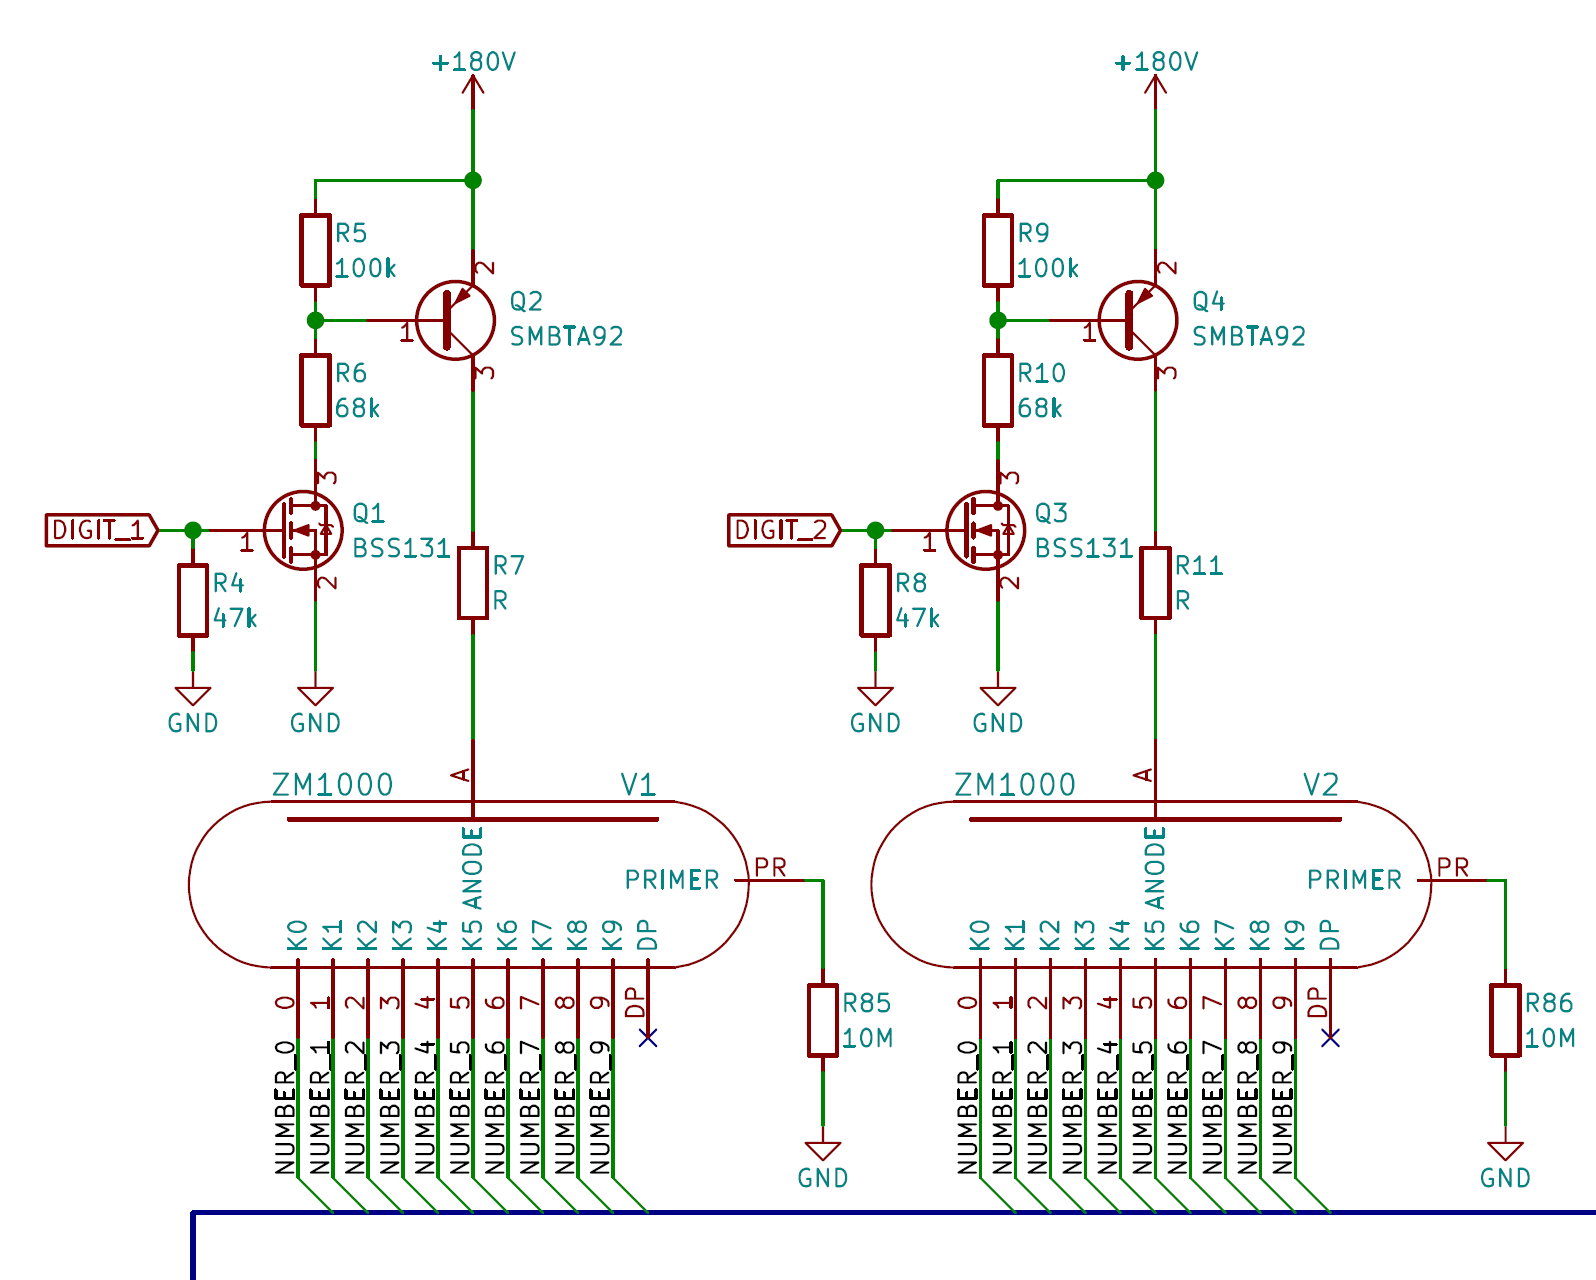 BP/pictures/digitrony_multiplex.png